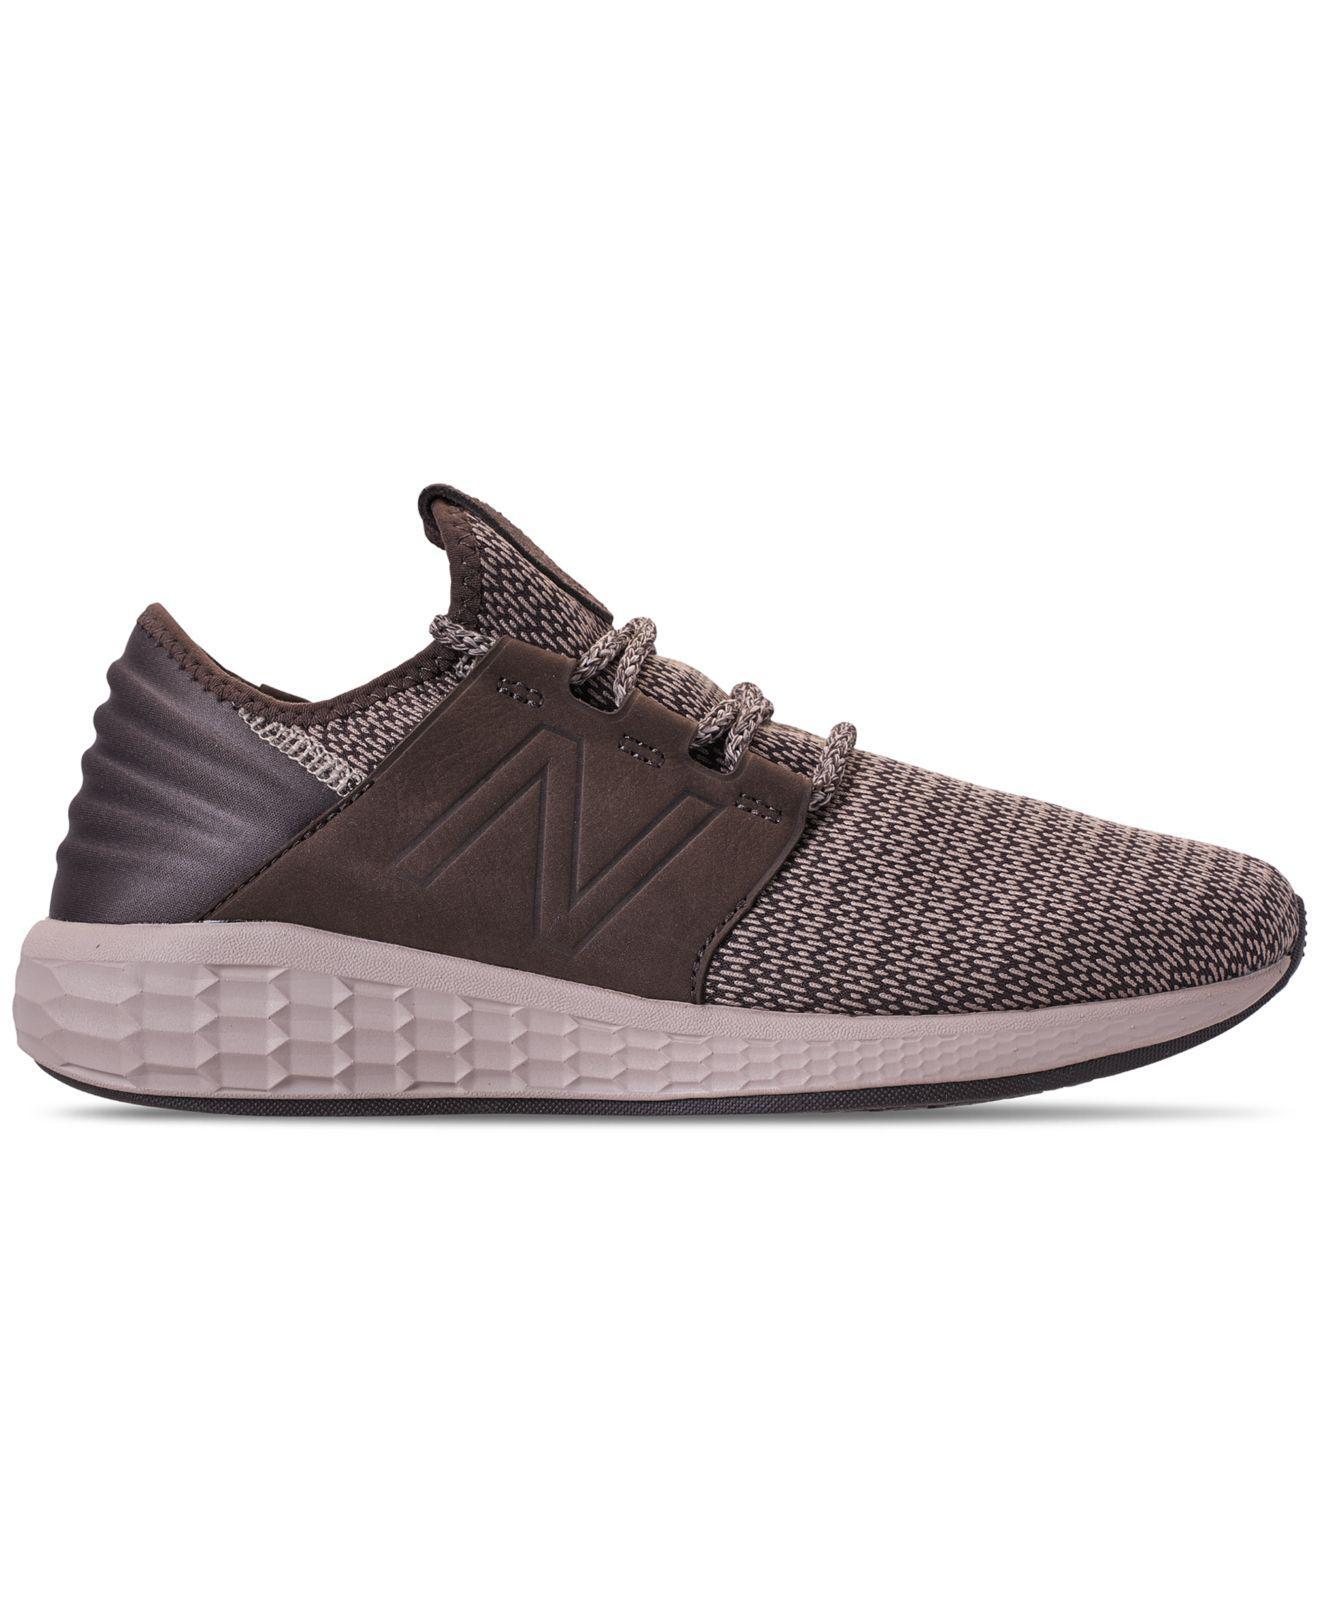 0dd5d1b21d4fa Lyst - New Balance Fresh Foam Cruz Running Sneakers From Finish Line in  Brown for Men